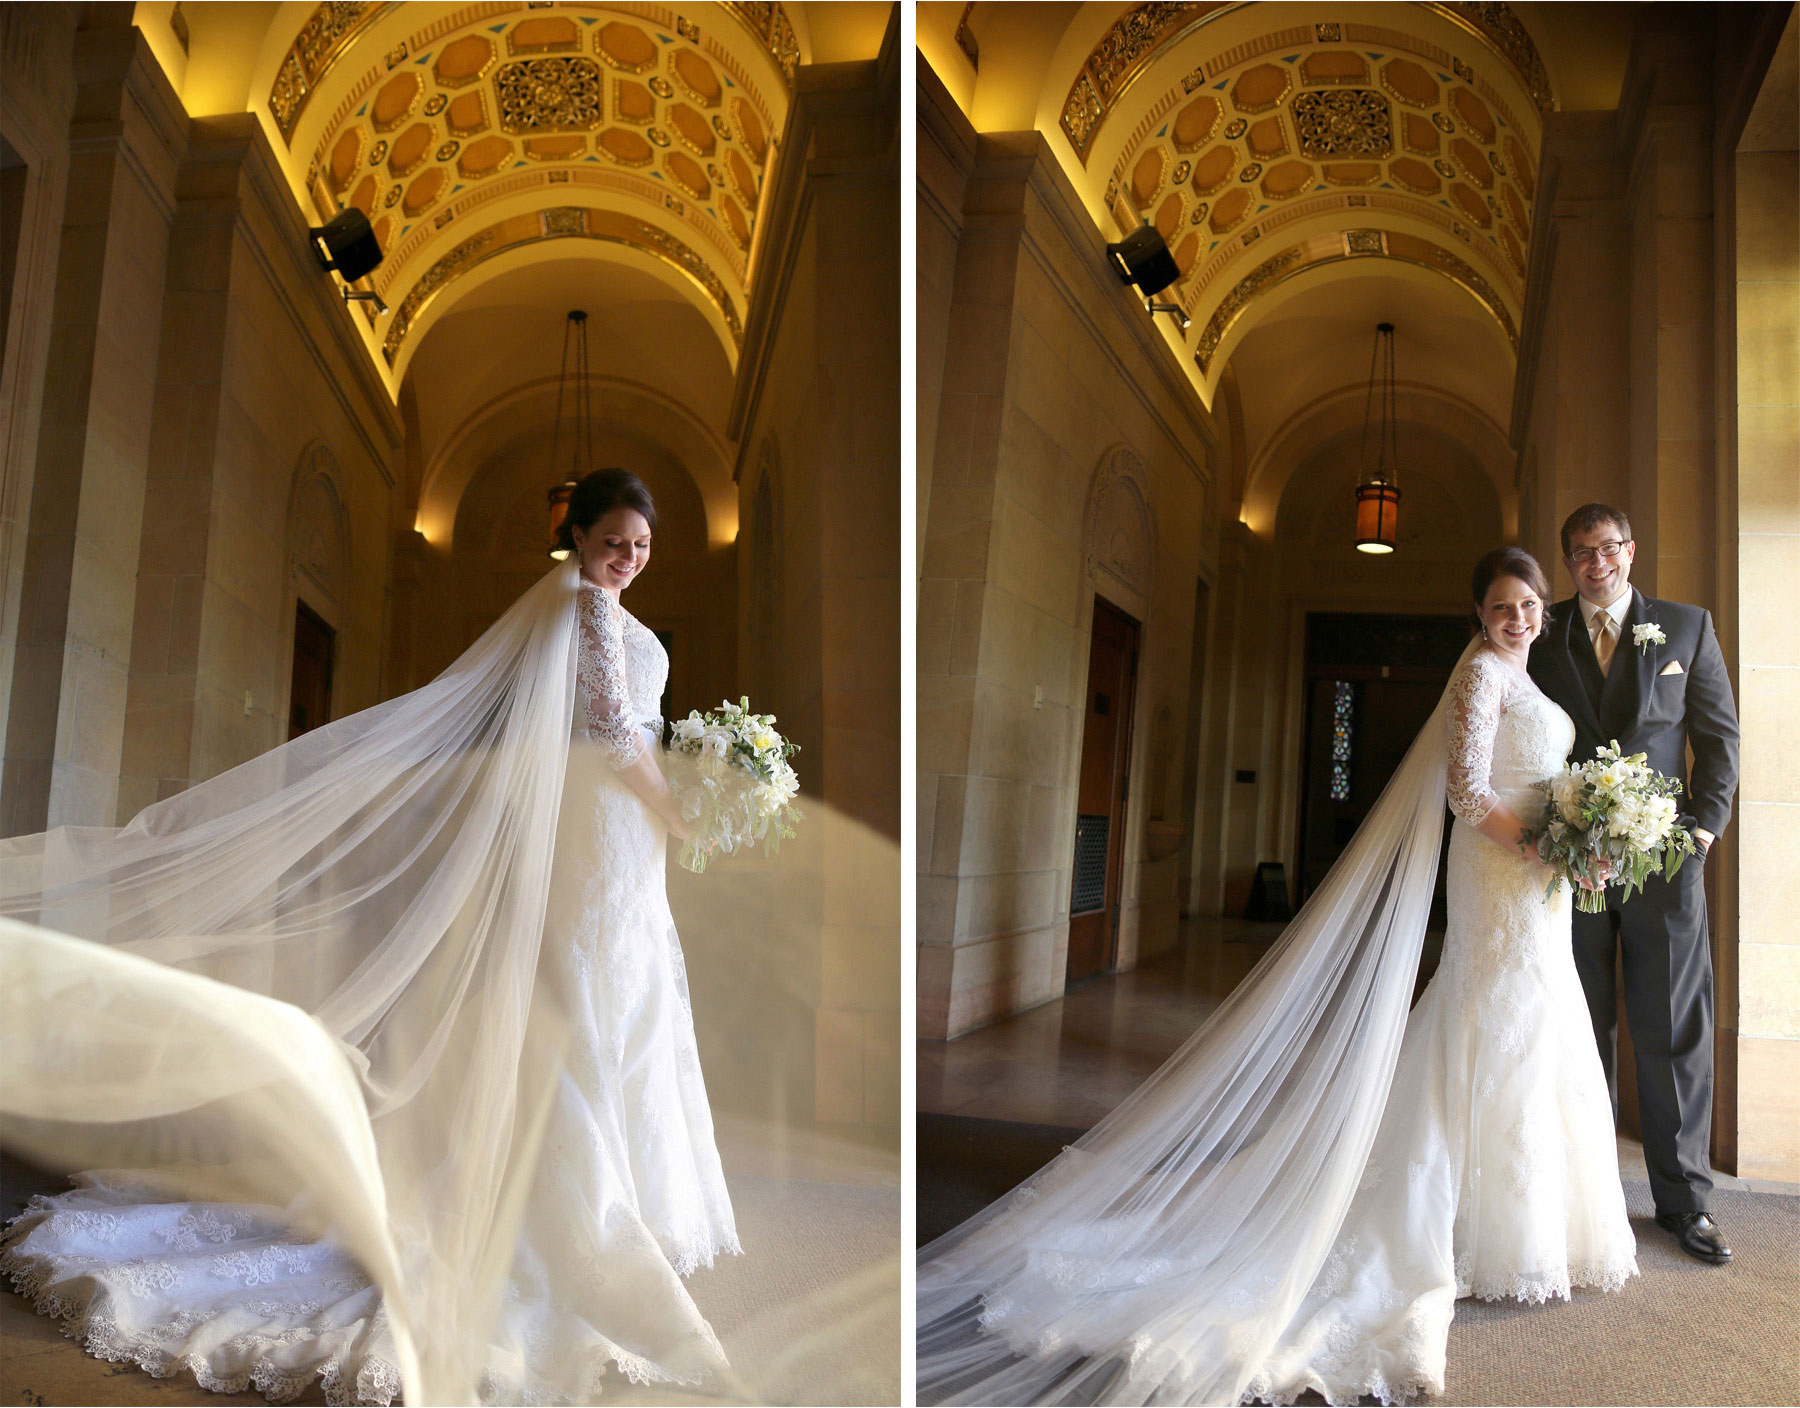 12-Minneapolis-Minnesota-Wedding-Photographer-by-Andrew-Vick-Photography-Winter-Basilica-of-Saint-Mary-Church-Bride-Groom-Veil-Flowers-Sara-and-Rob.jpg